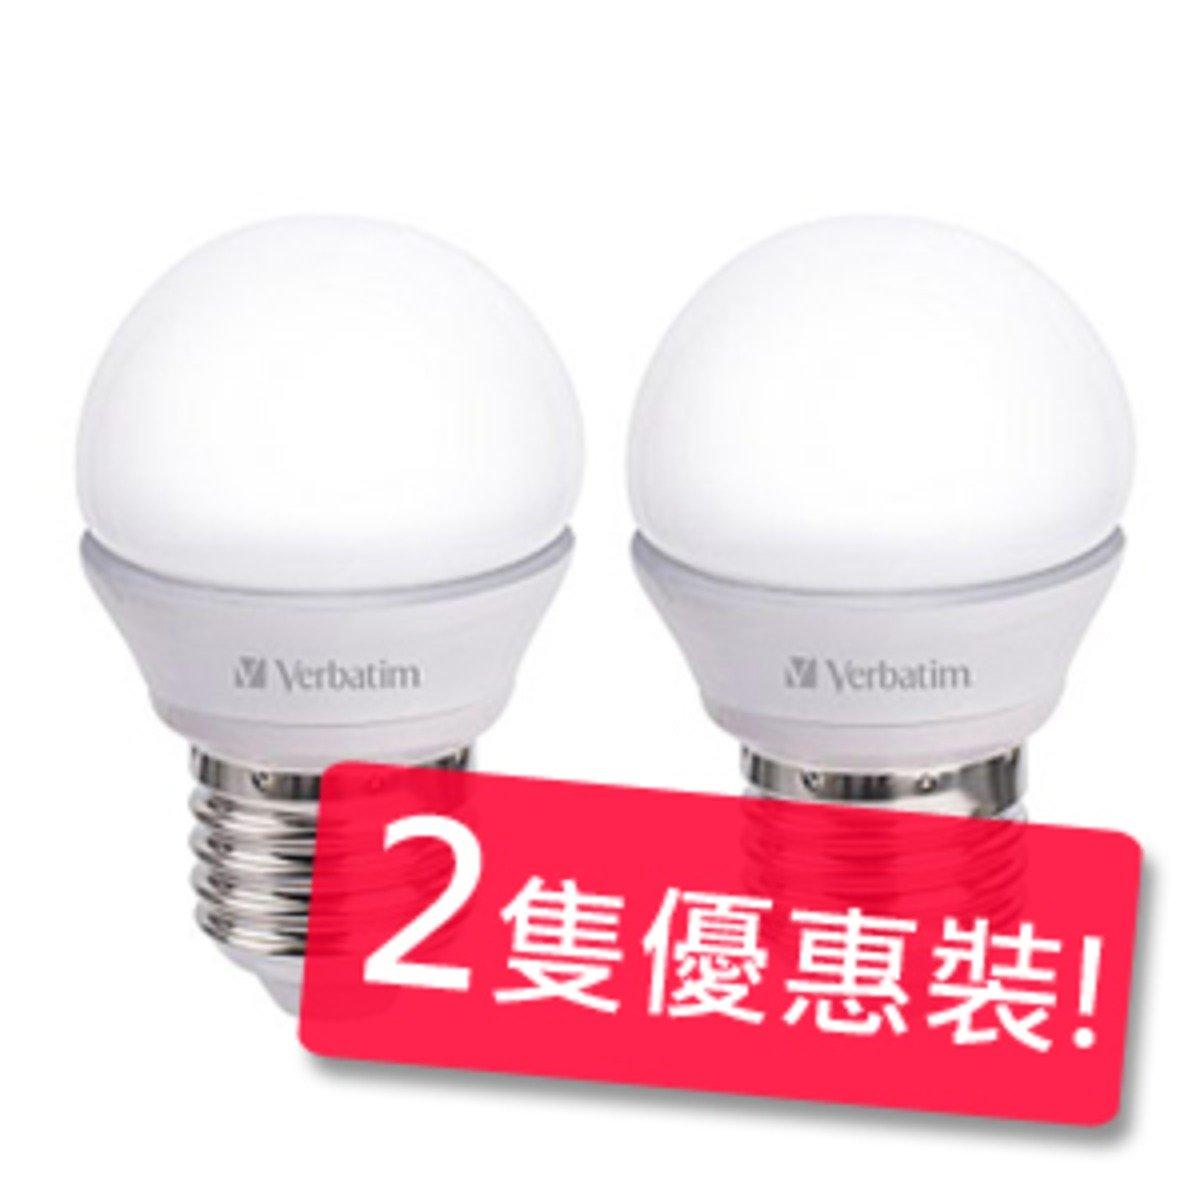 Verbatim 4.5瓦 E27 350lm 3000k 燈泡 (暖白) 2隻優惠裝